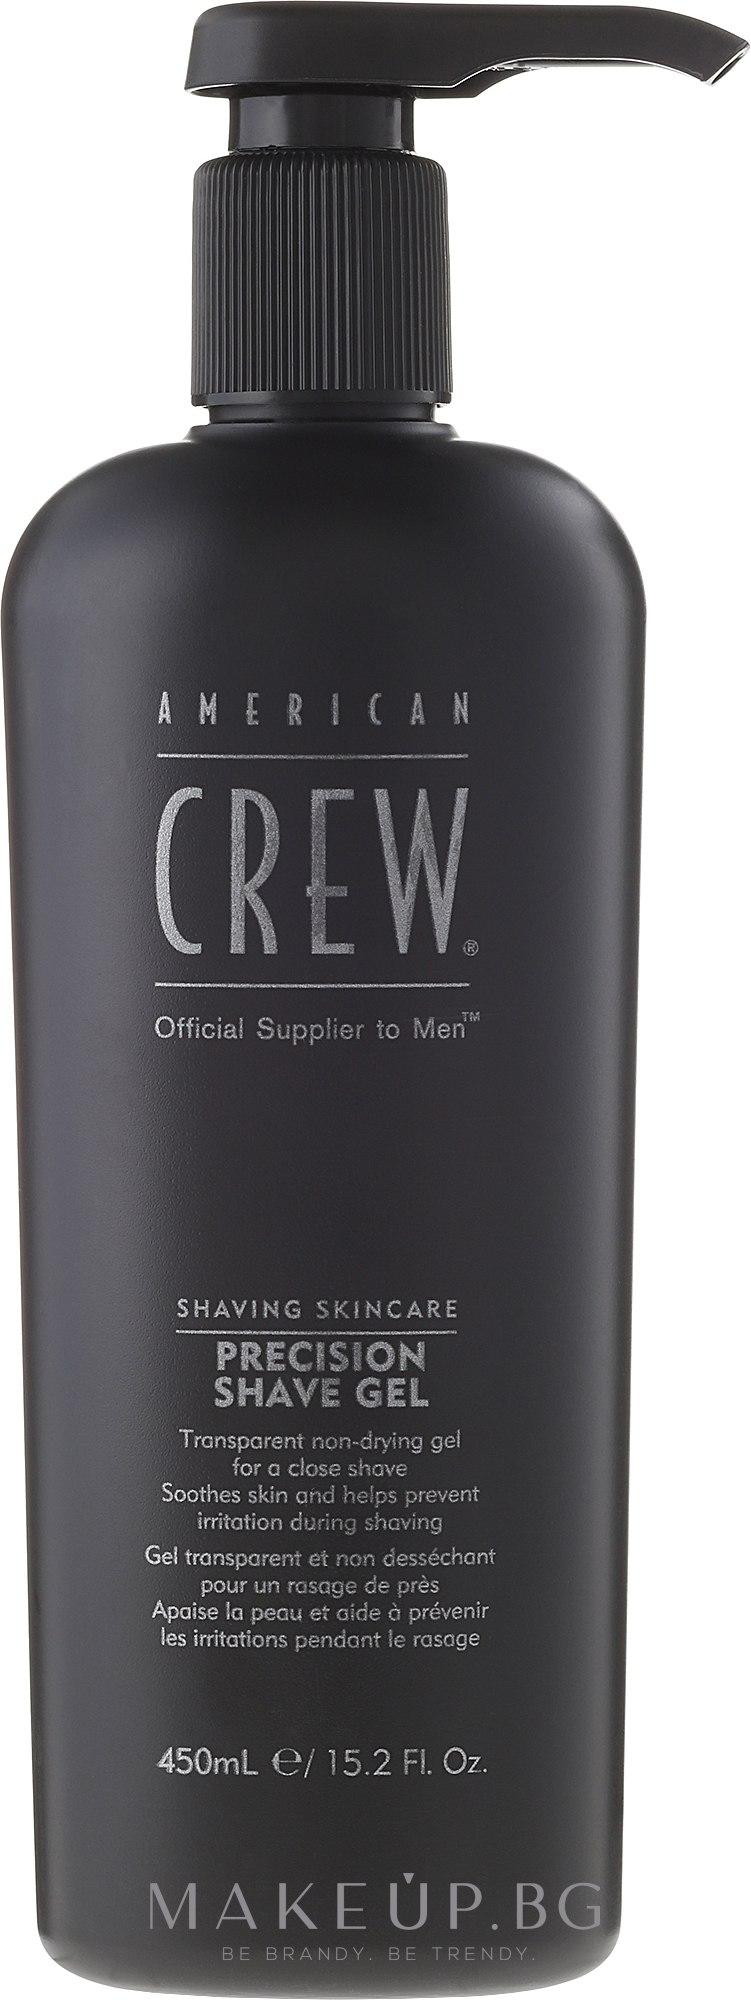 Гел за фино бръснене - American Crew Shaving Skincare Precision Shave Gel — снимка 450 ml